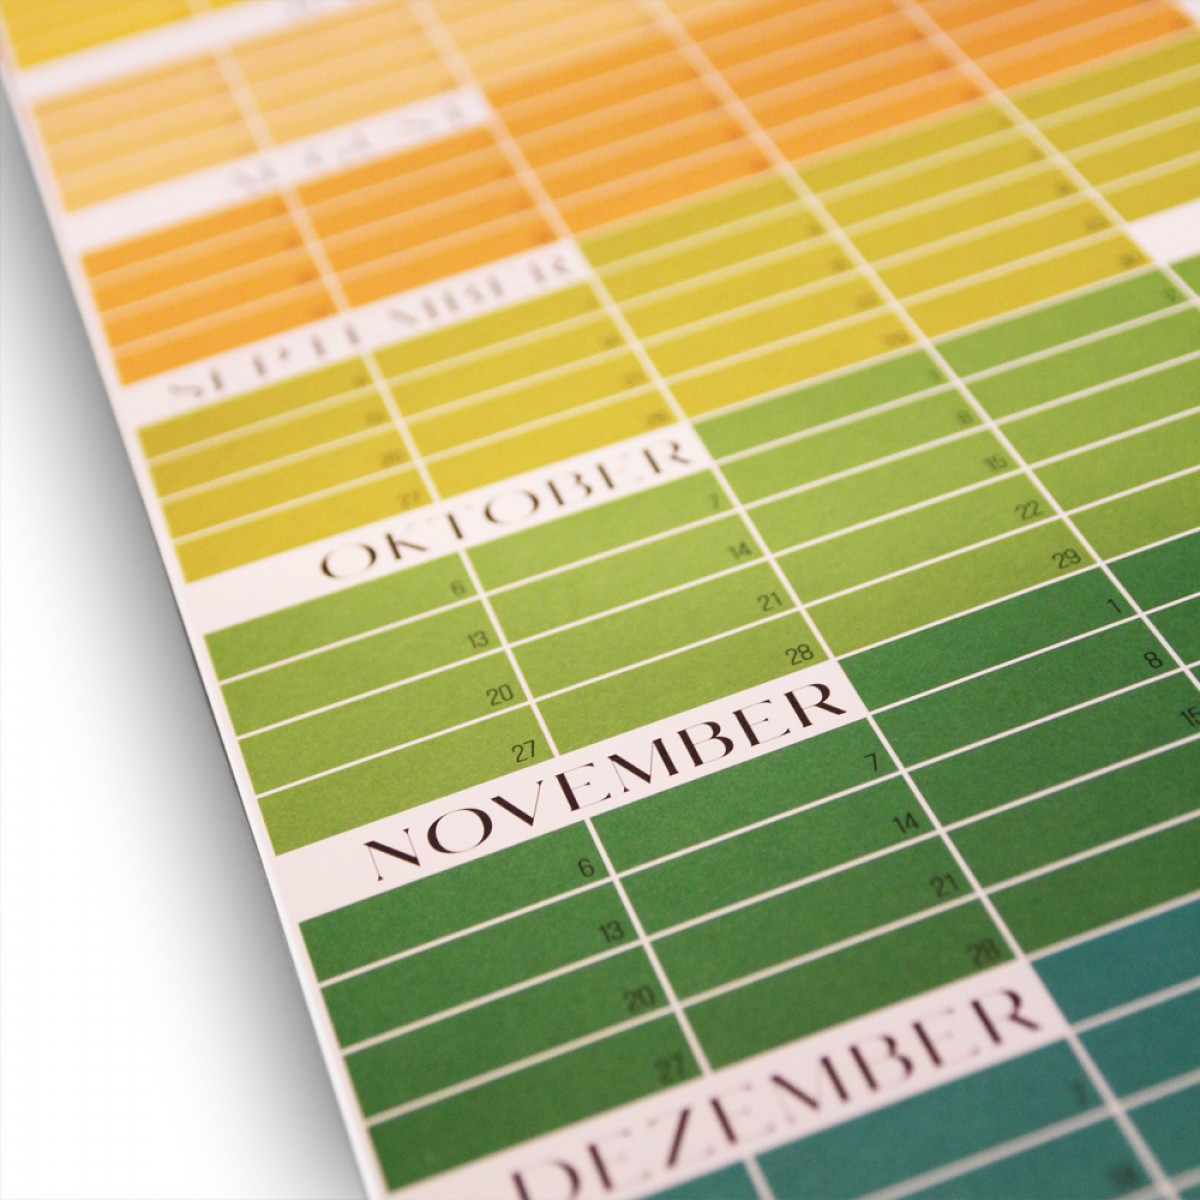 EVERGREEN – Immerwährender Kalender | Ewiger Kalender | Wandplaner | Grün-Gelb